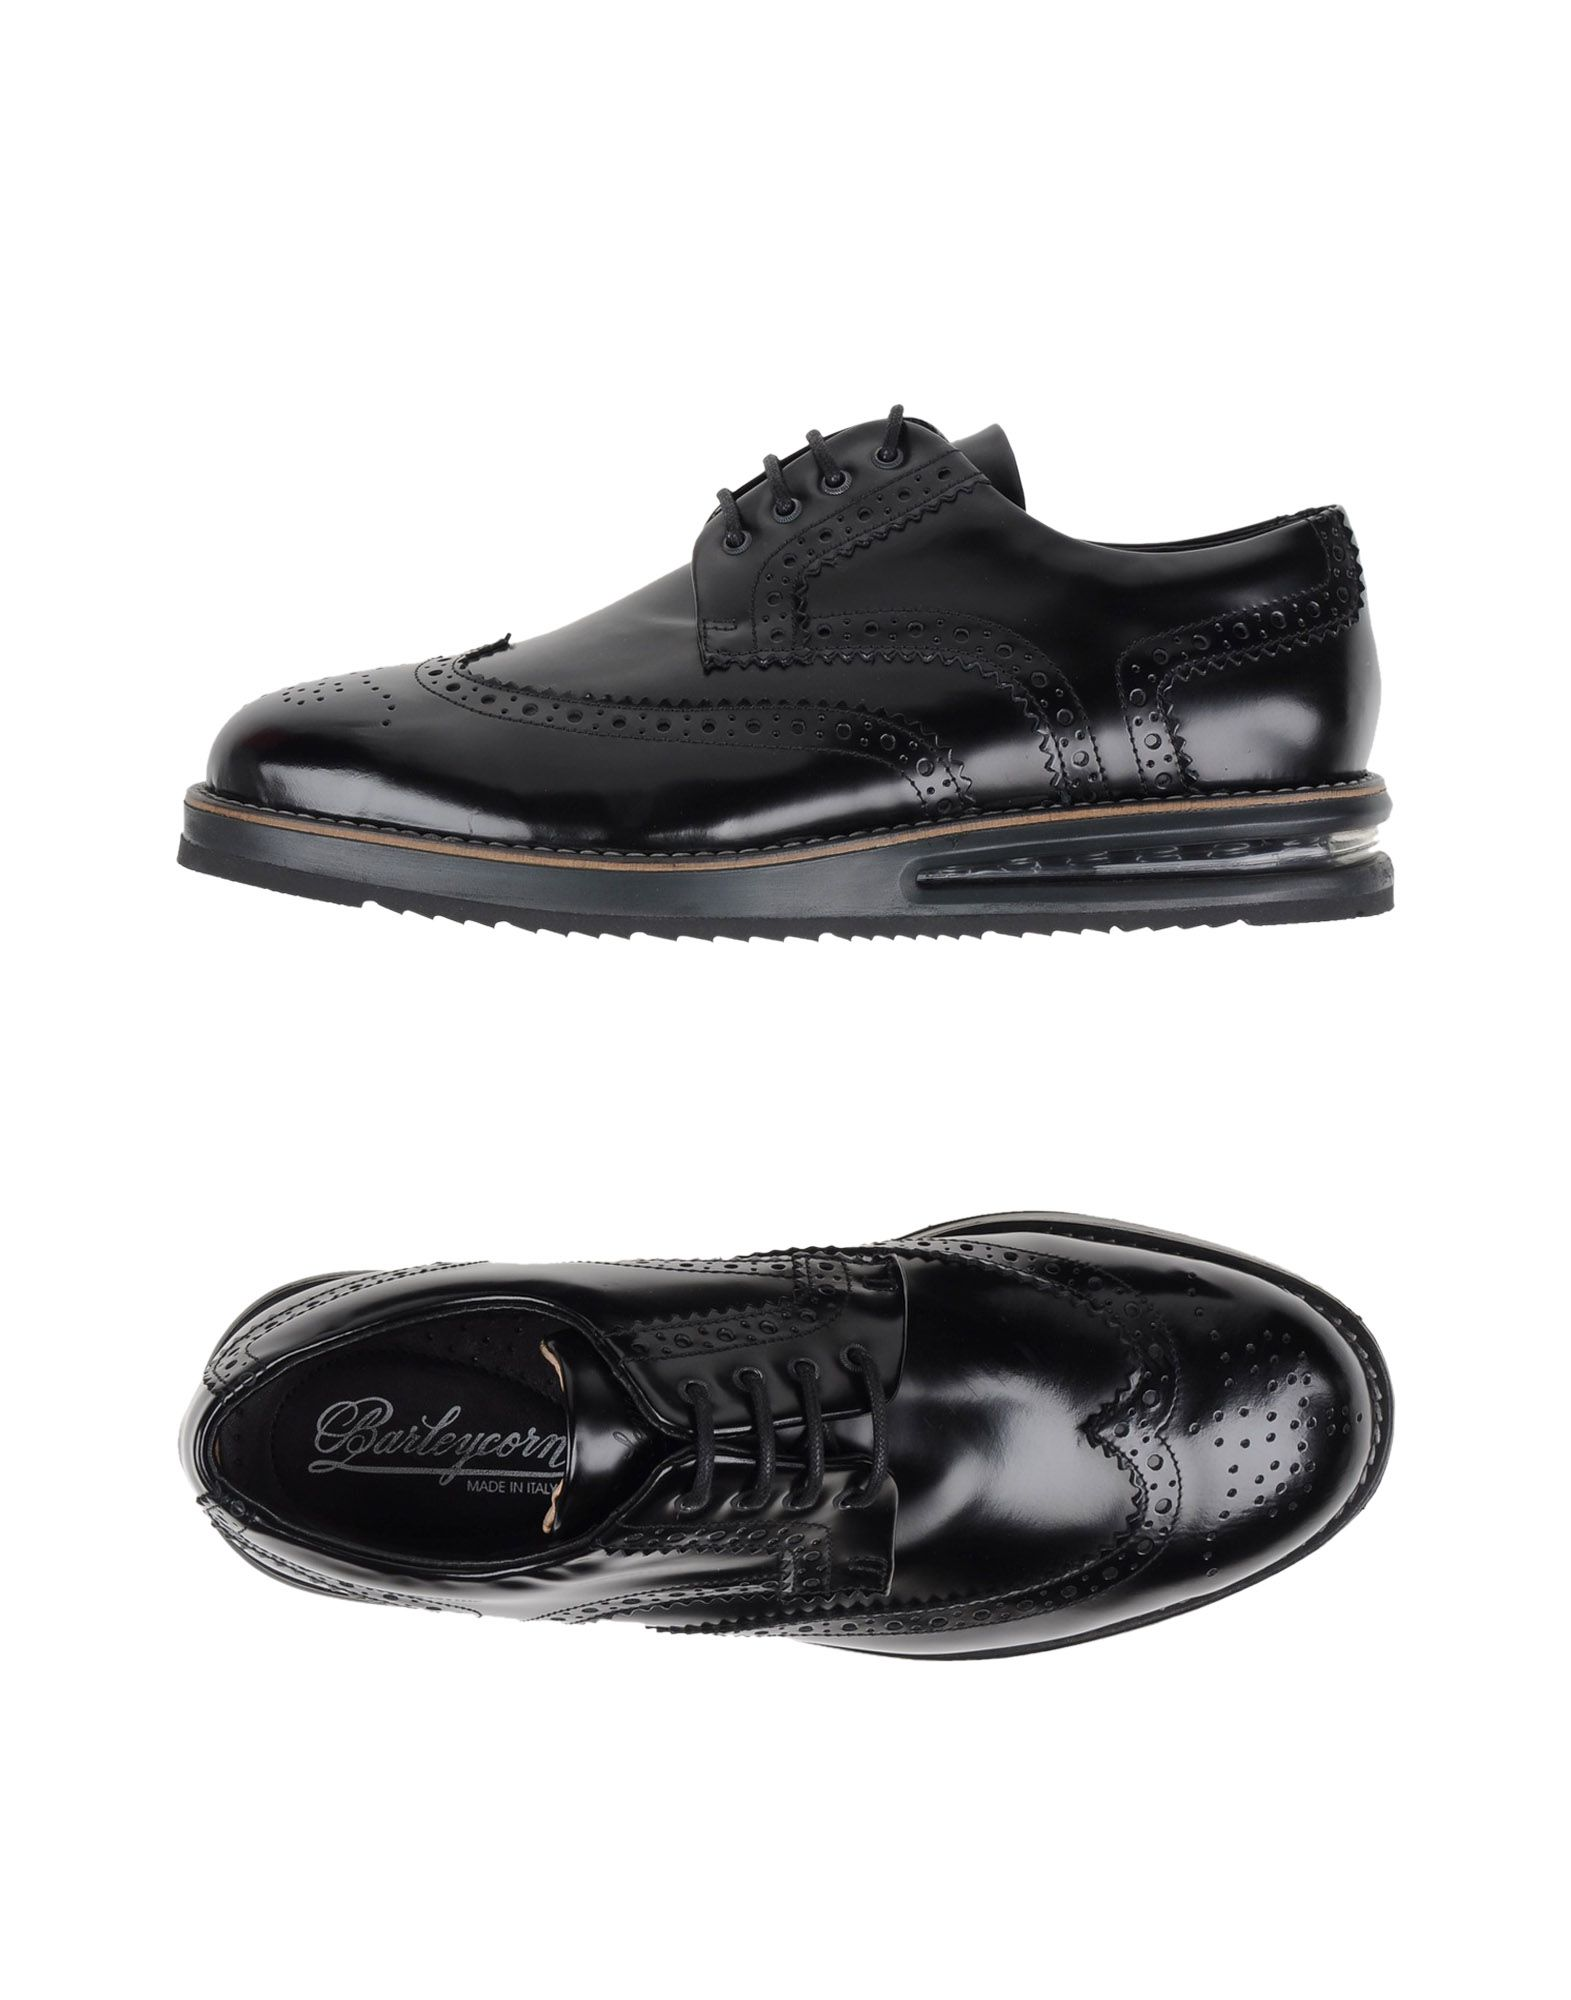 Chaussures À Lacets Barleycorn Femme - Chaussures À Lacets Barleycorn sur